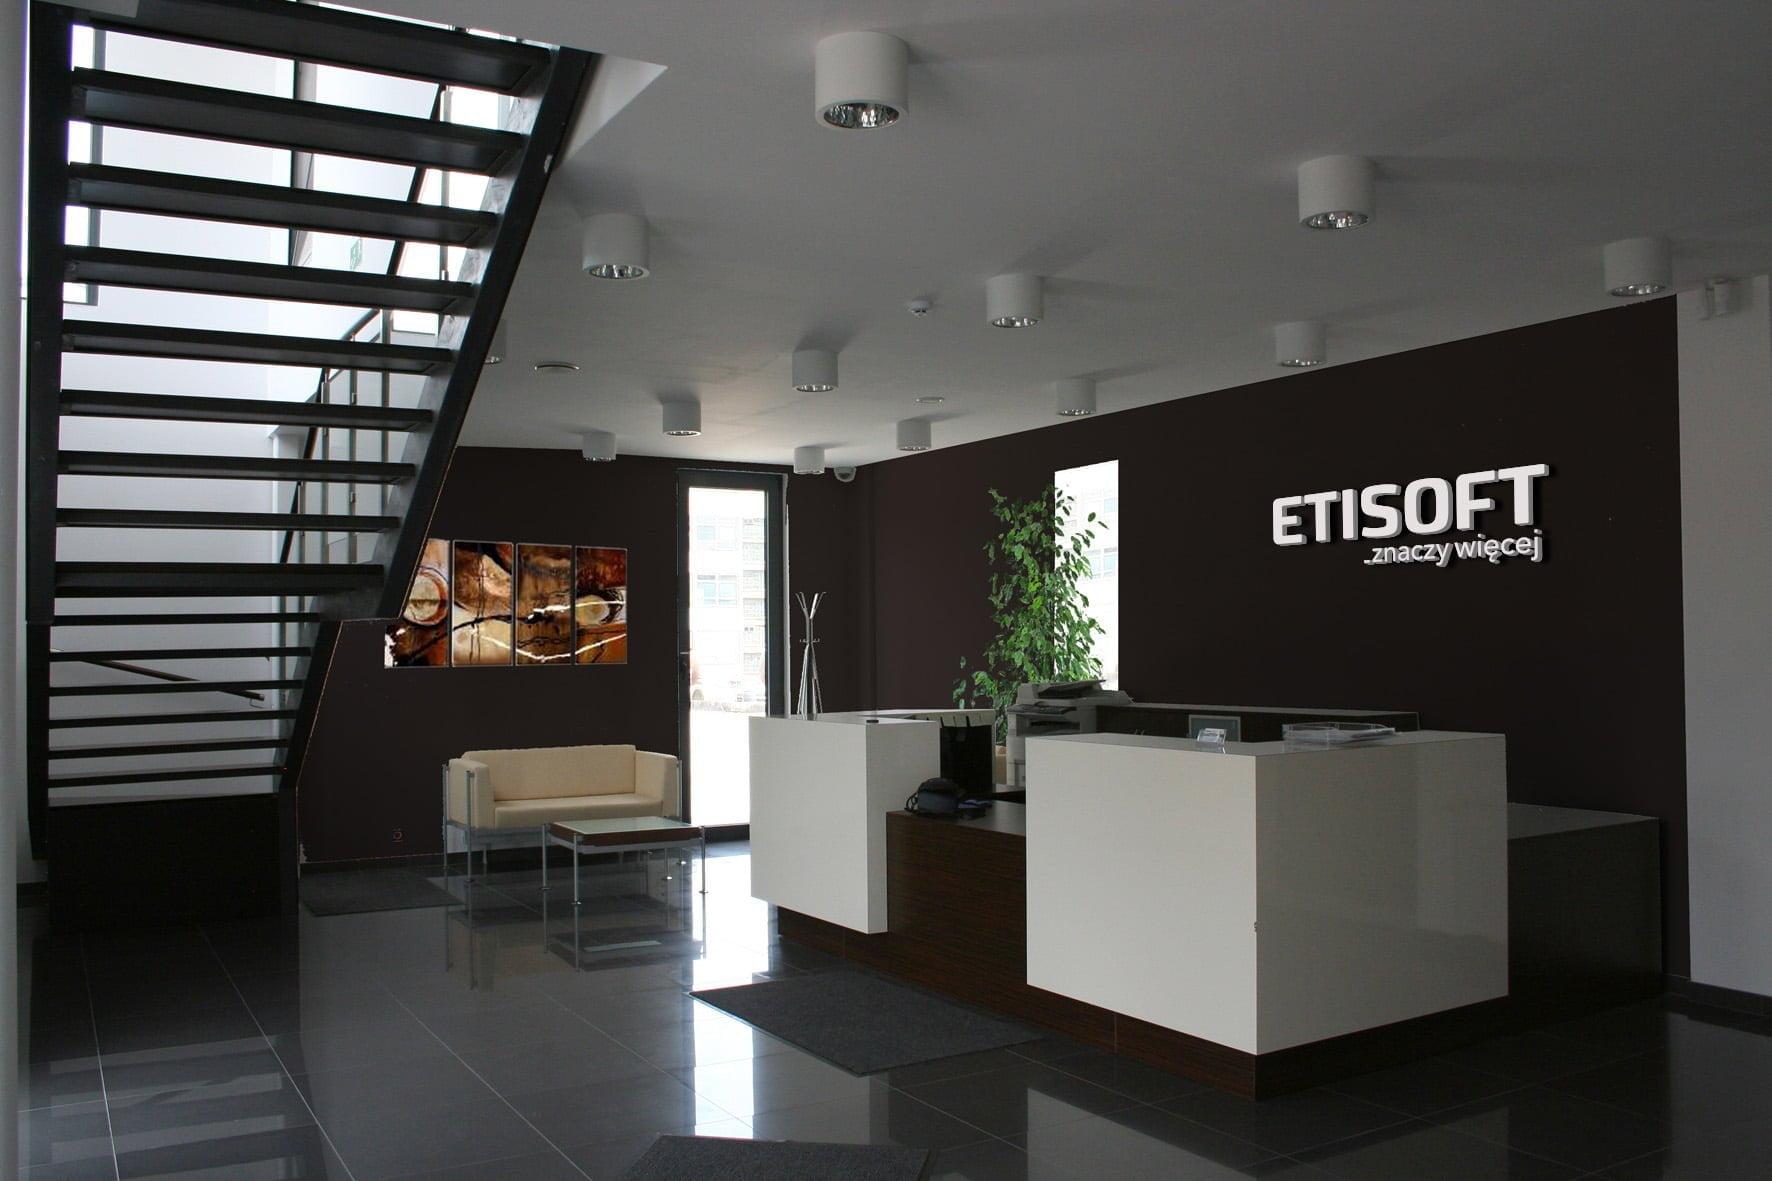 Etisoft